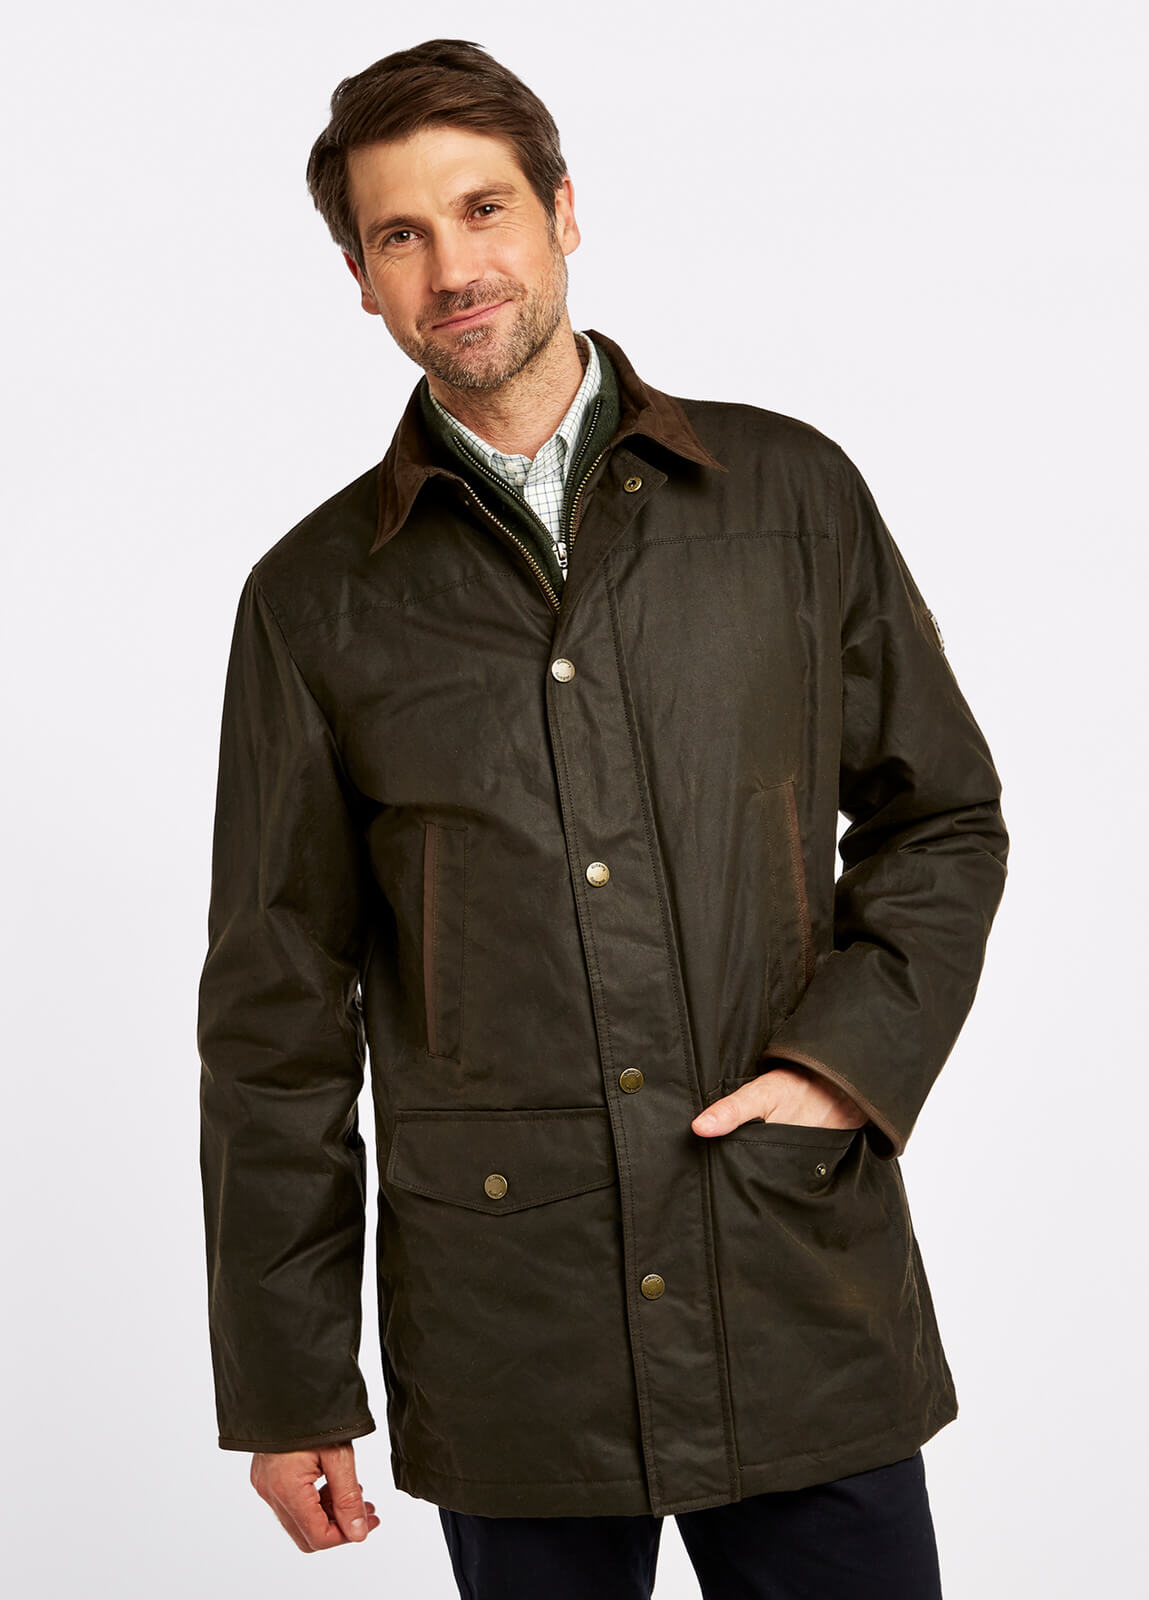 Headford Waxed Jacket - Olive